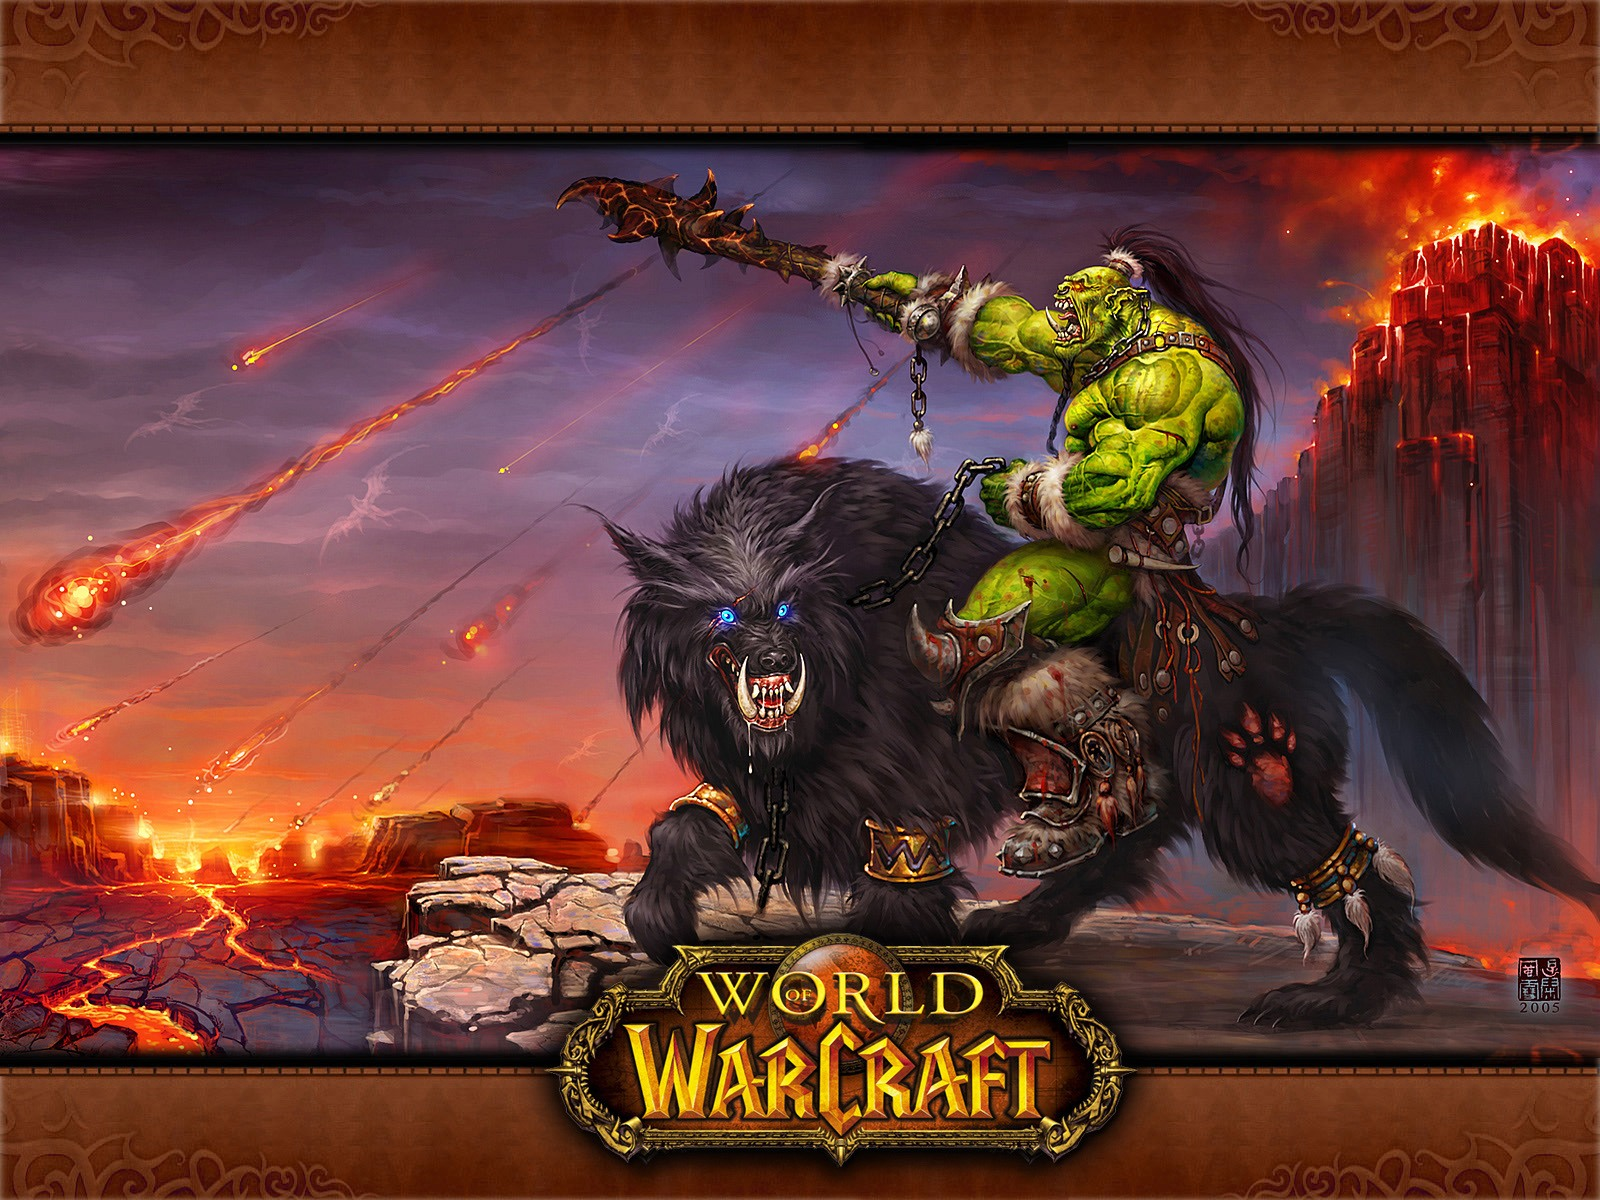 Free Download World Of Warcraft Orc Desktop Wallpaper